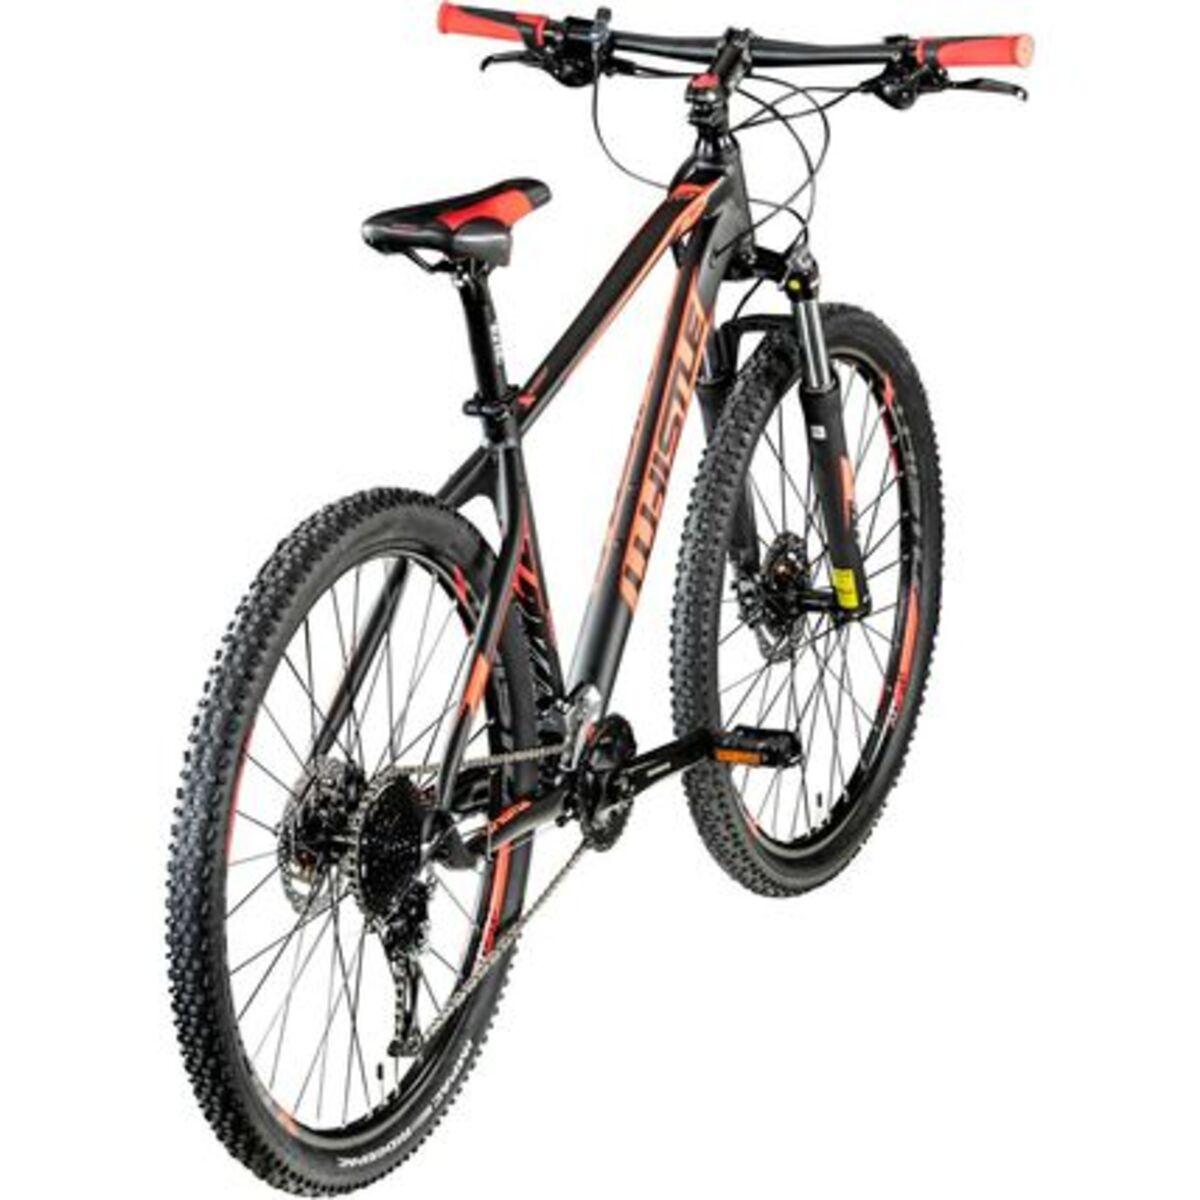 Bild 3 von Whistle Miwok 2052 650B Mountainbike